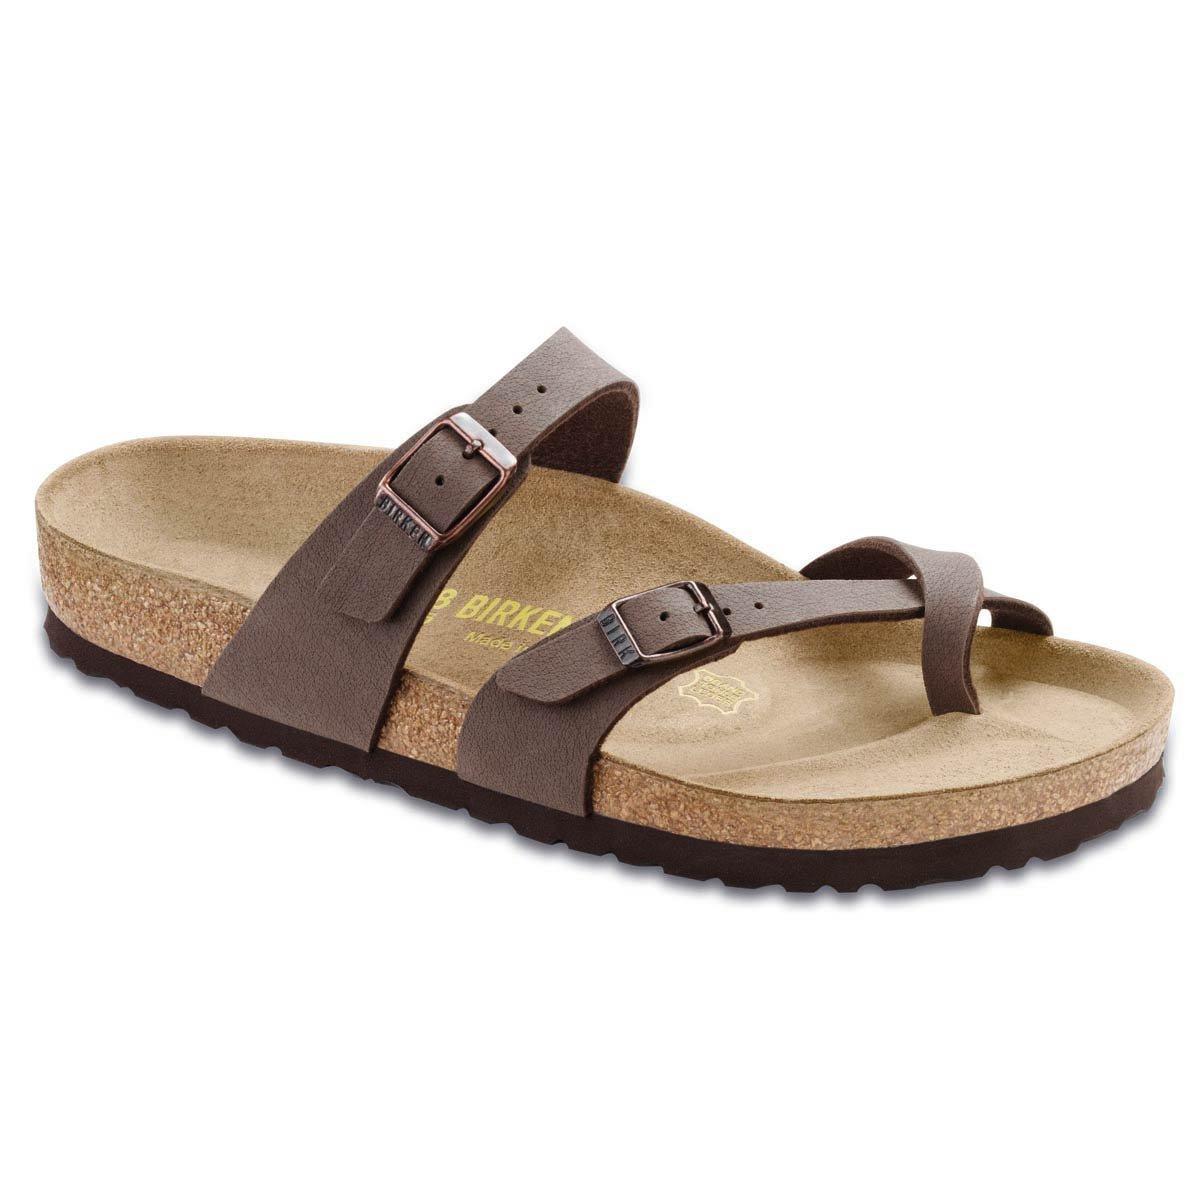 Birkenstock Women's Mayari Mocha Birkibuc Sandal 35 N (US Women's 4-4.5)